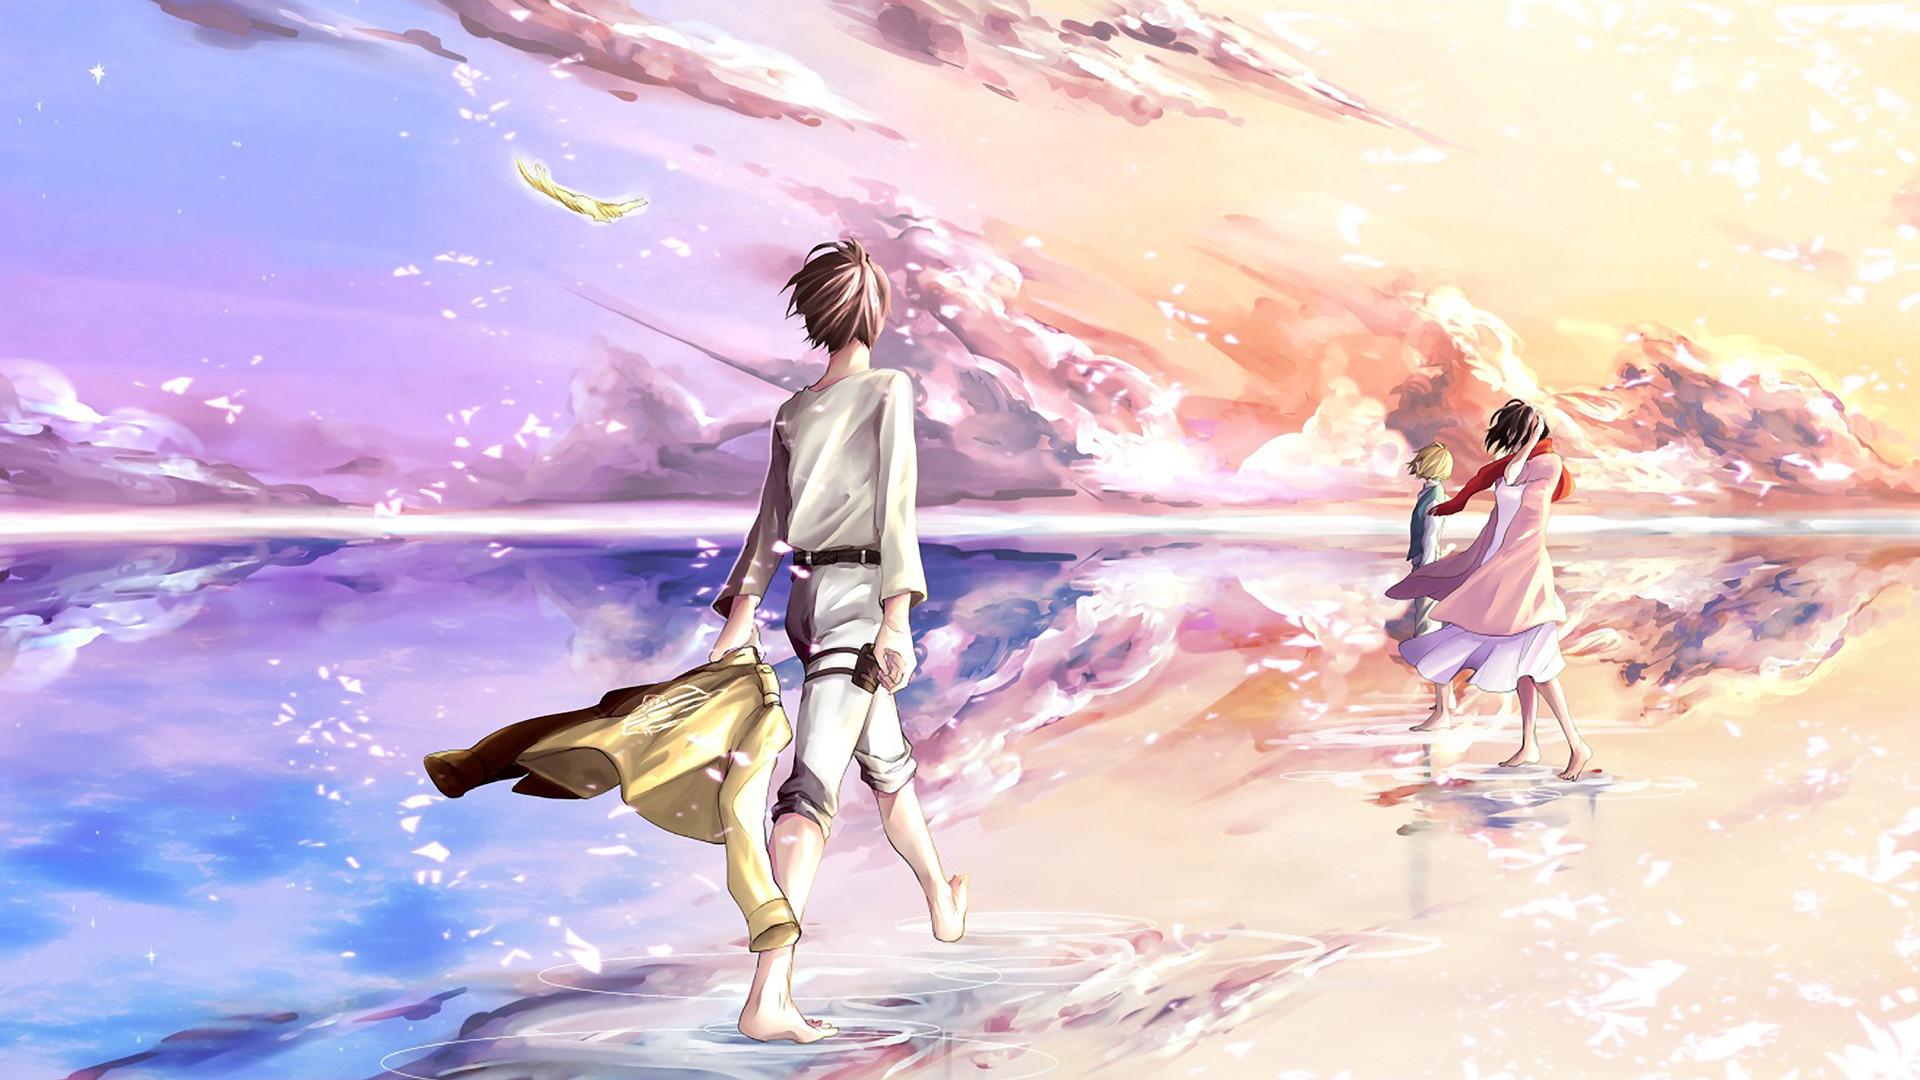 Shingeki no Kyojin » Fanart » Wallpaper   Pastel cloudy skies   #eren  #armin #mikasa   Shingeki no Kyojin   Pinterest   Armin, Fanart and Anime